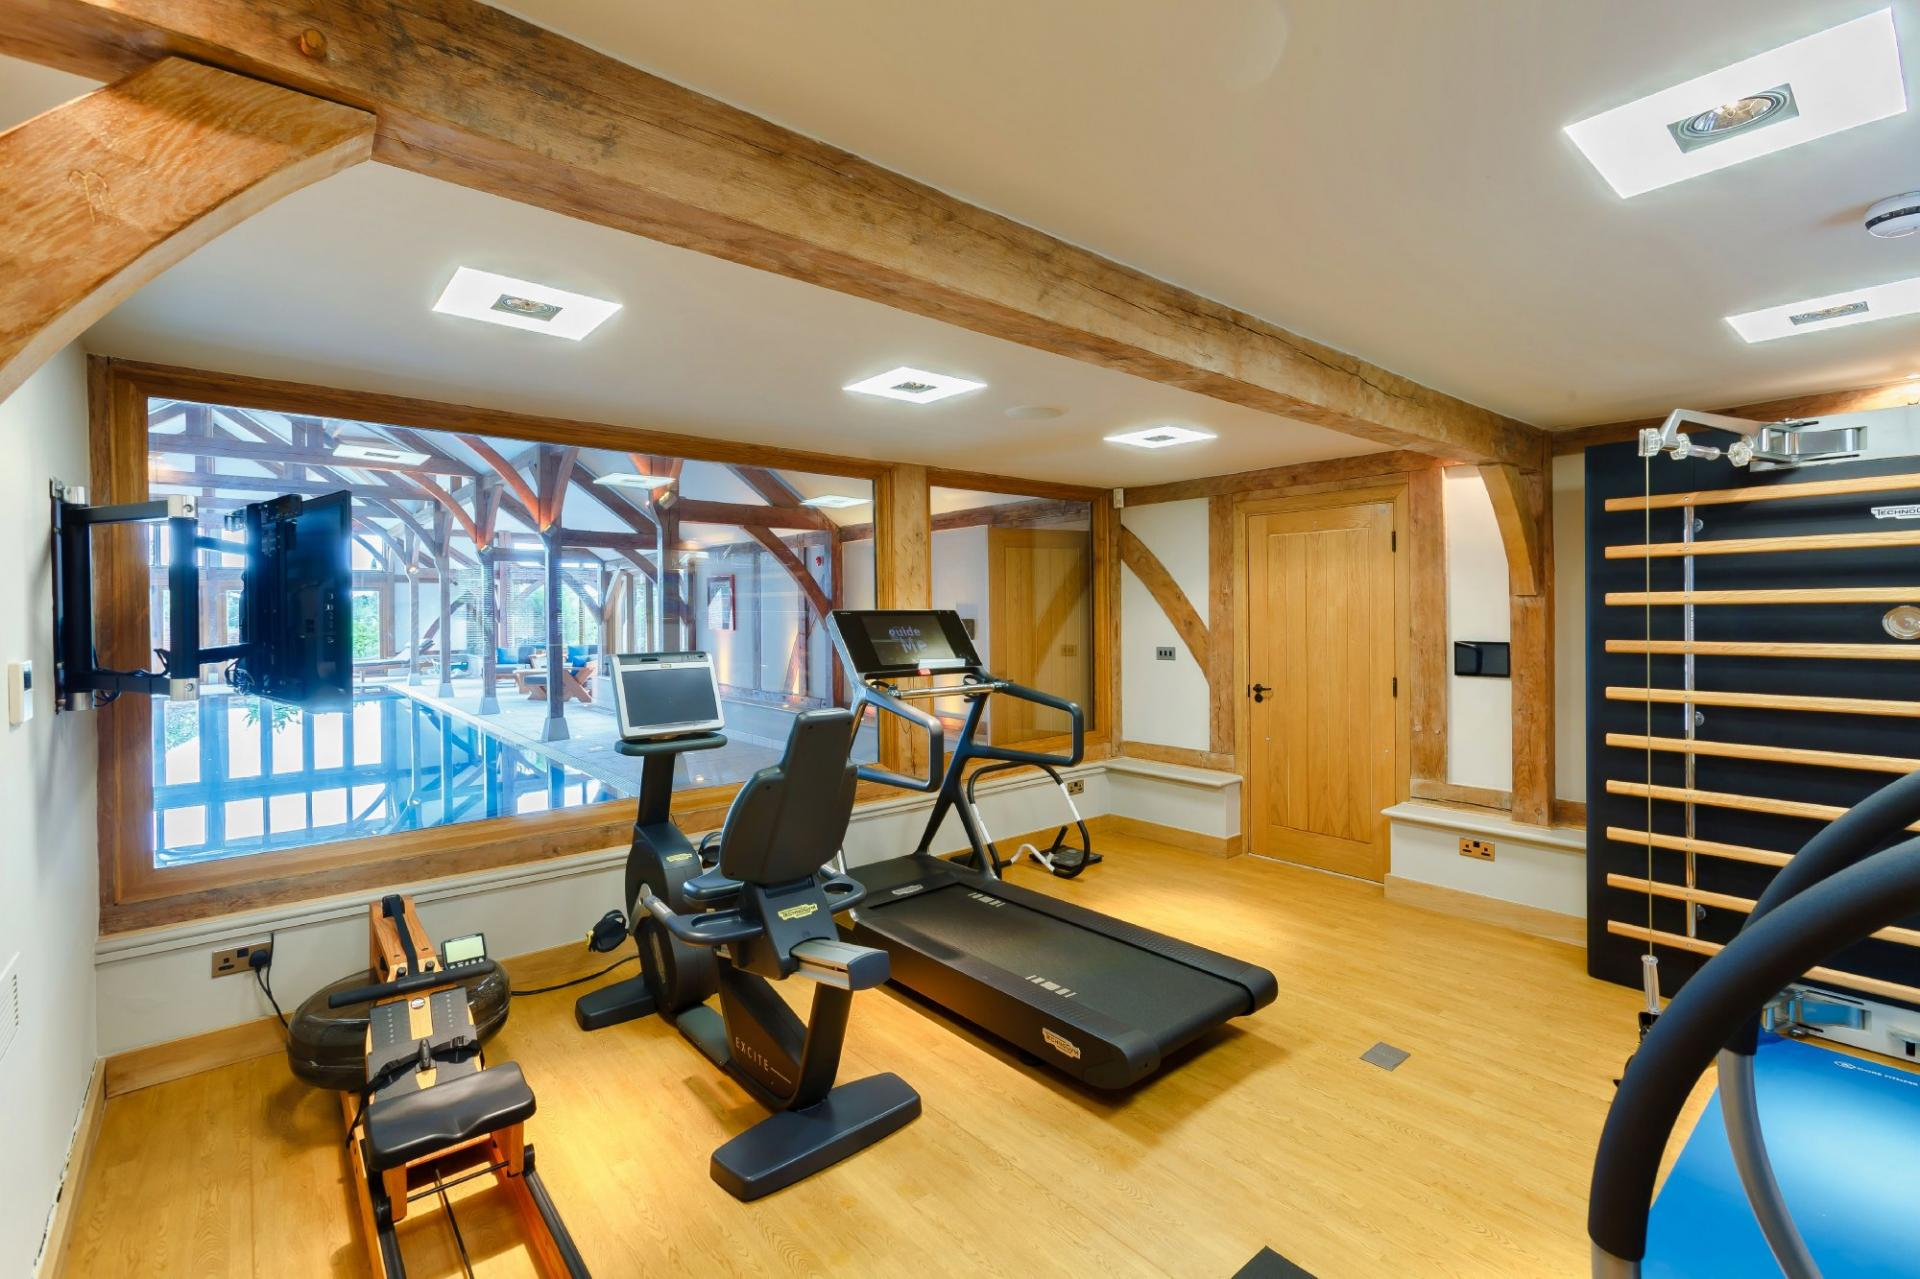 Maldon, Essex, 6 Bedrooms, Home Gym